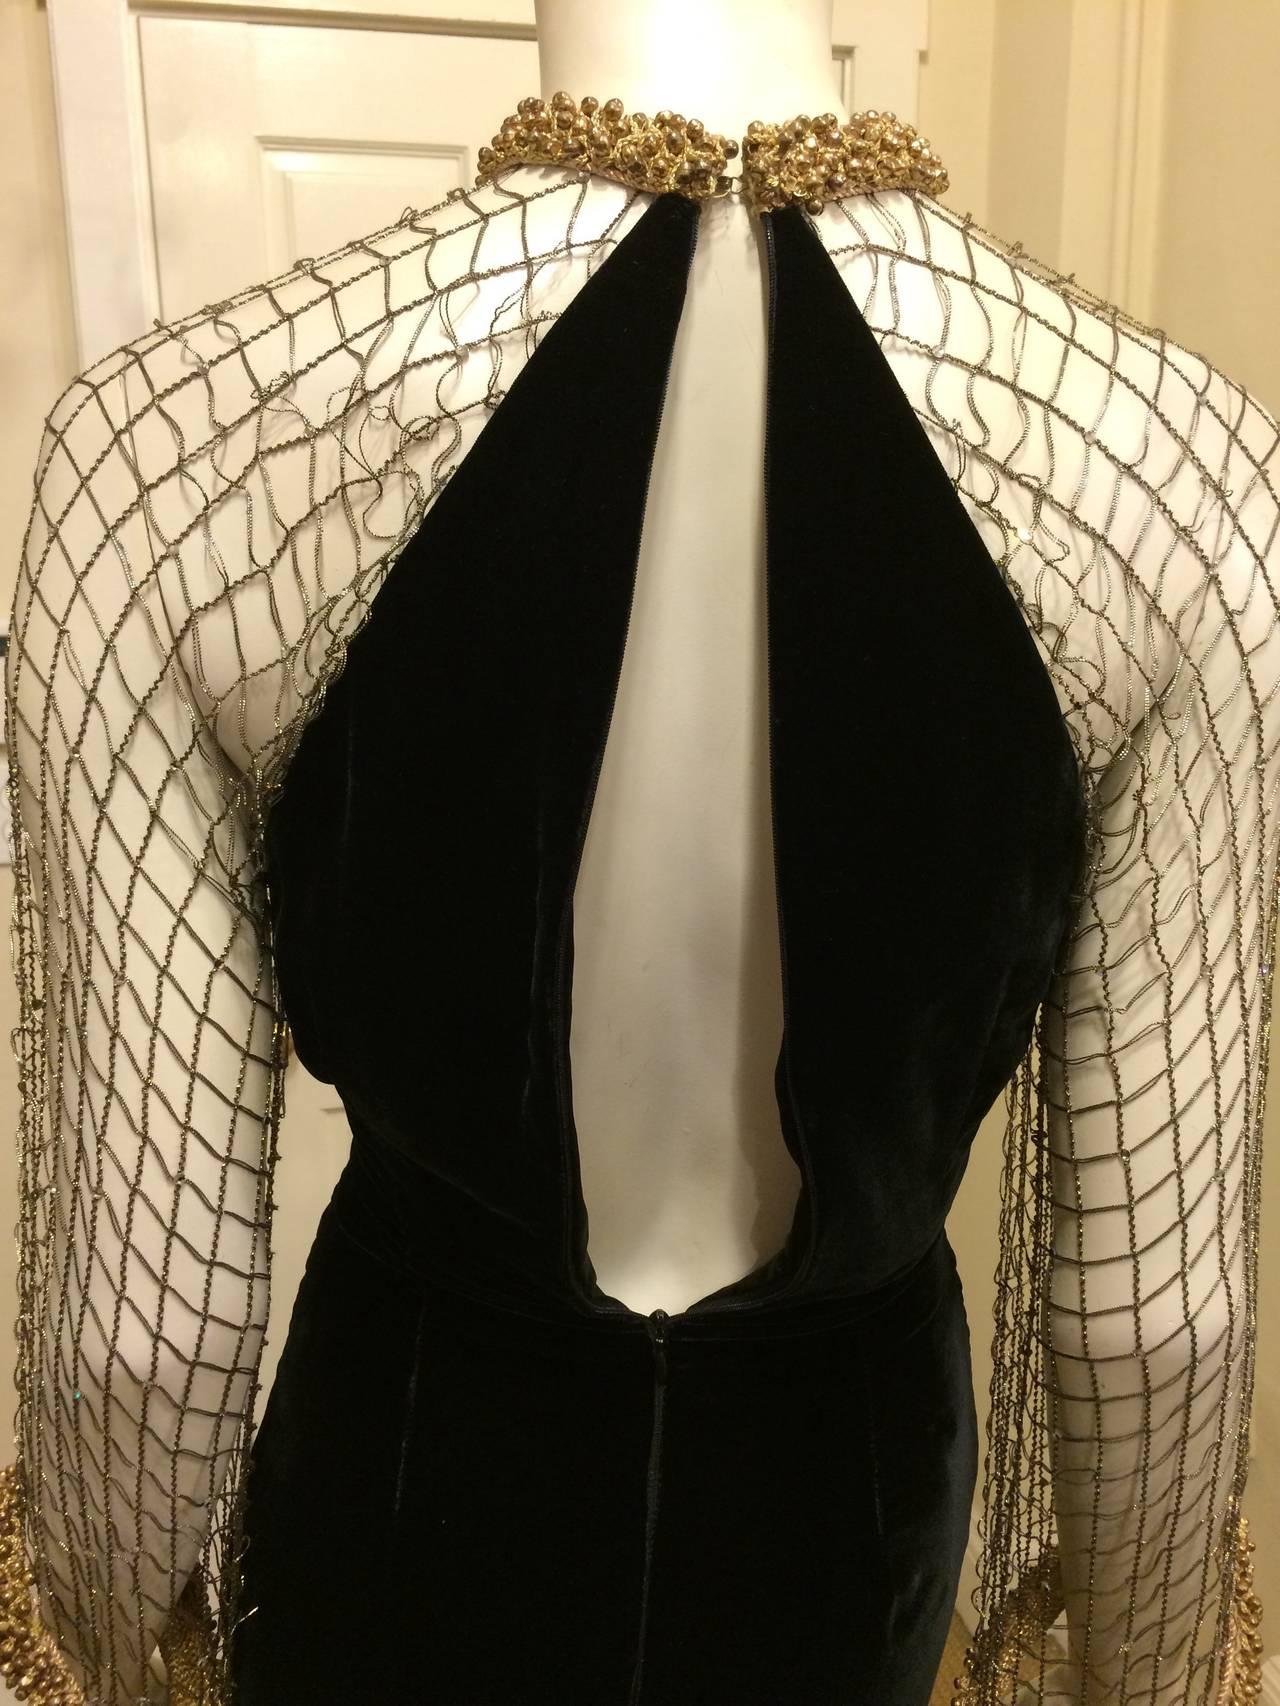 Oscar de la Renta Black Velvet Gown with Gold Netting 6